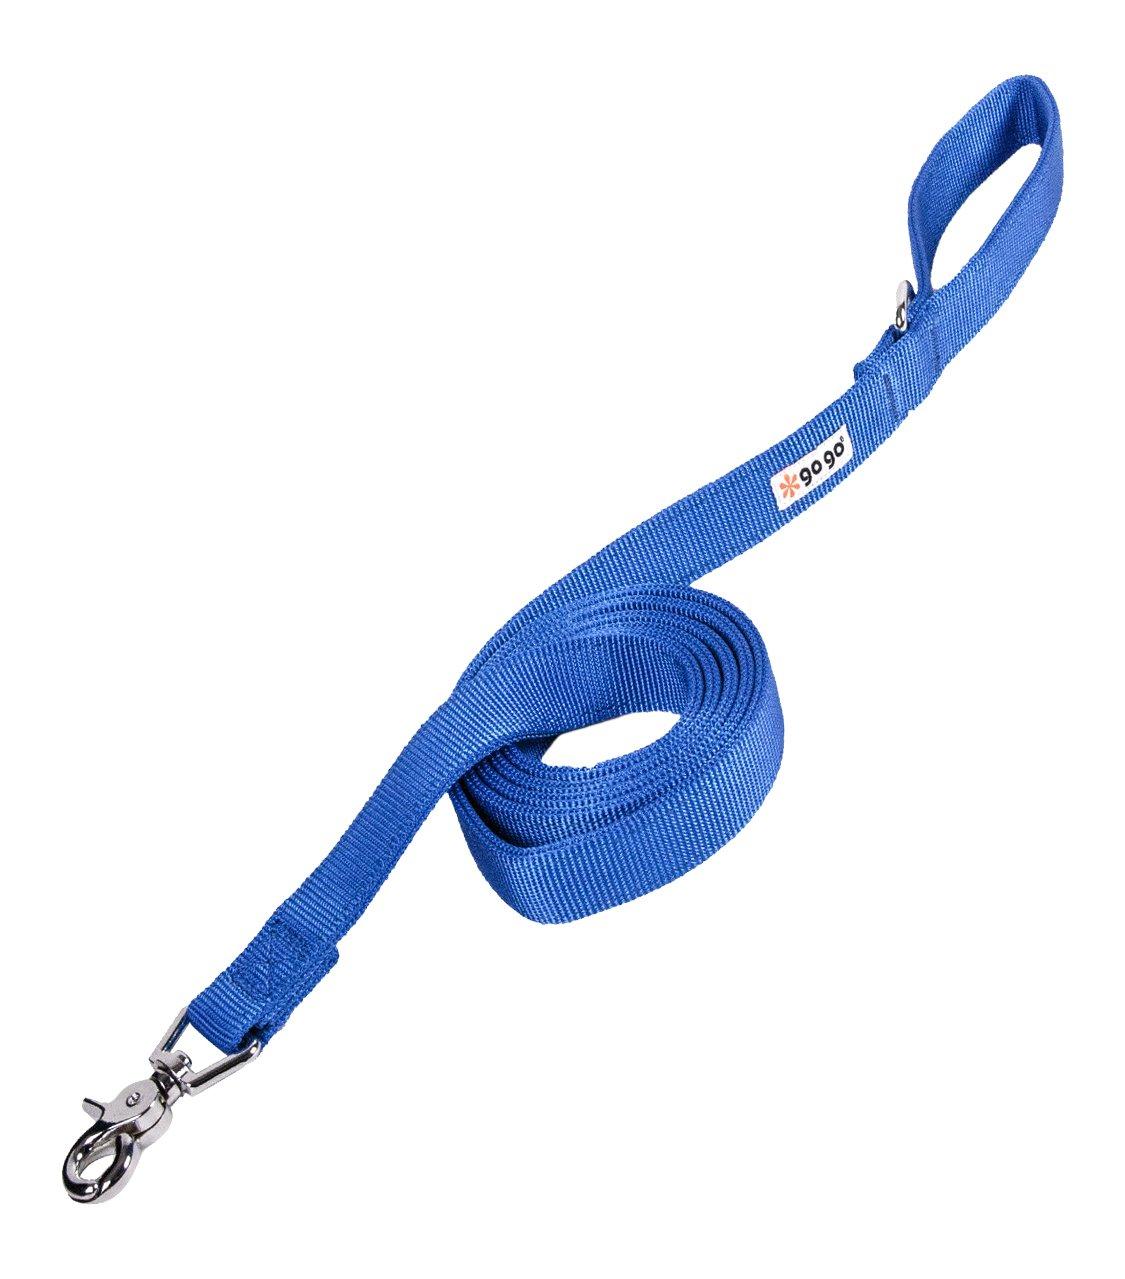 GoGo Pet Products 1-Inch Wide Comfy Nylon Dog Leash, 6-Feet Long, Blue